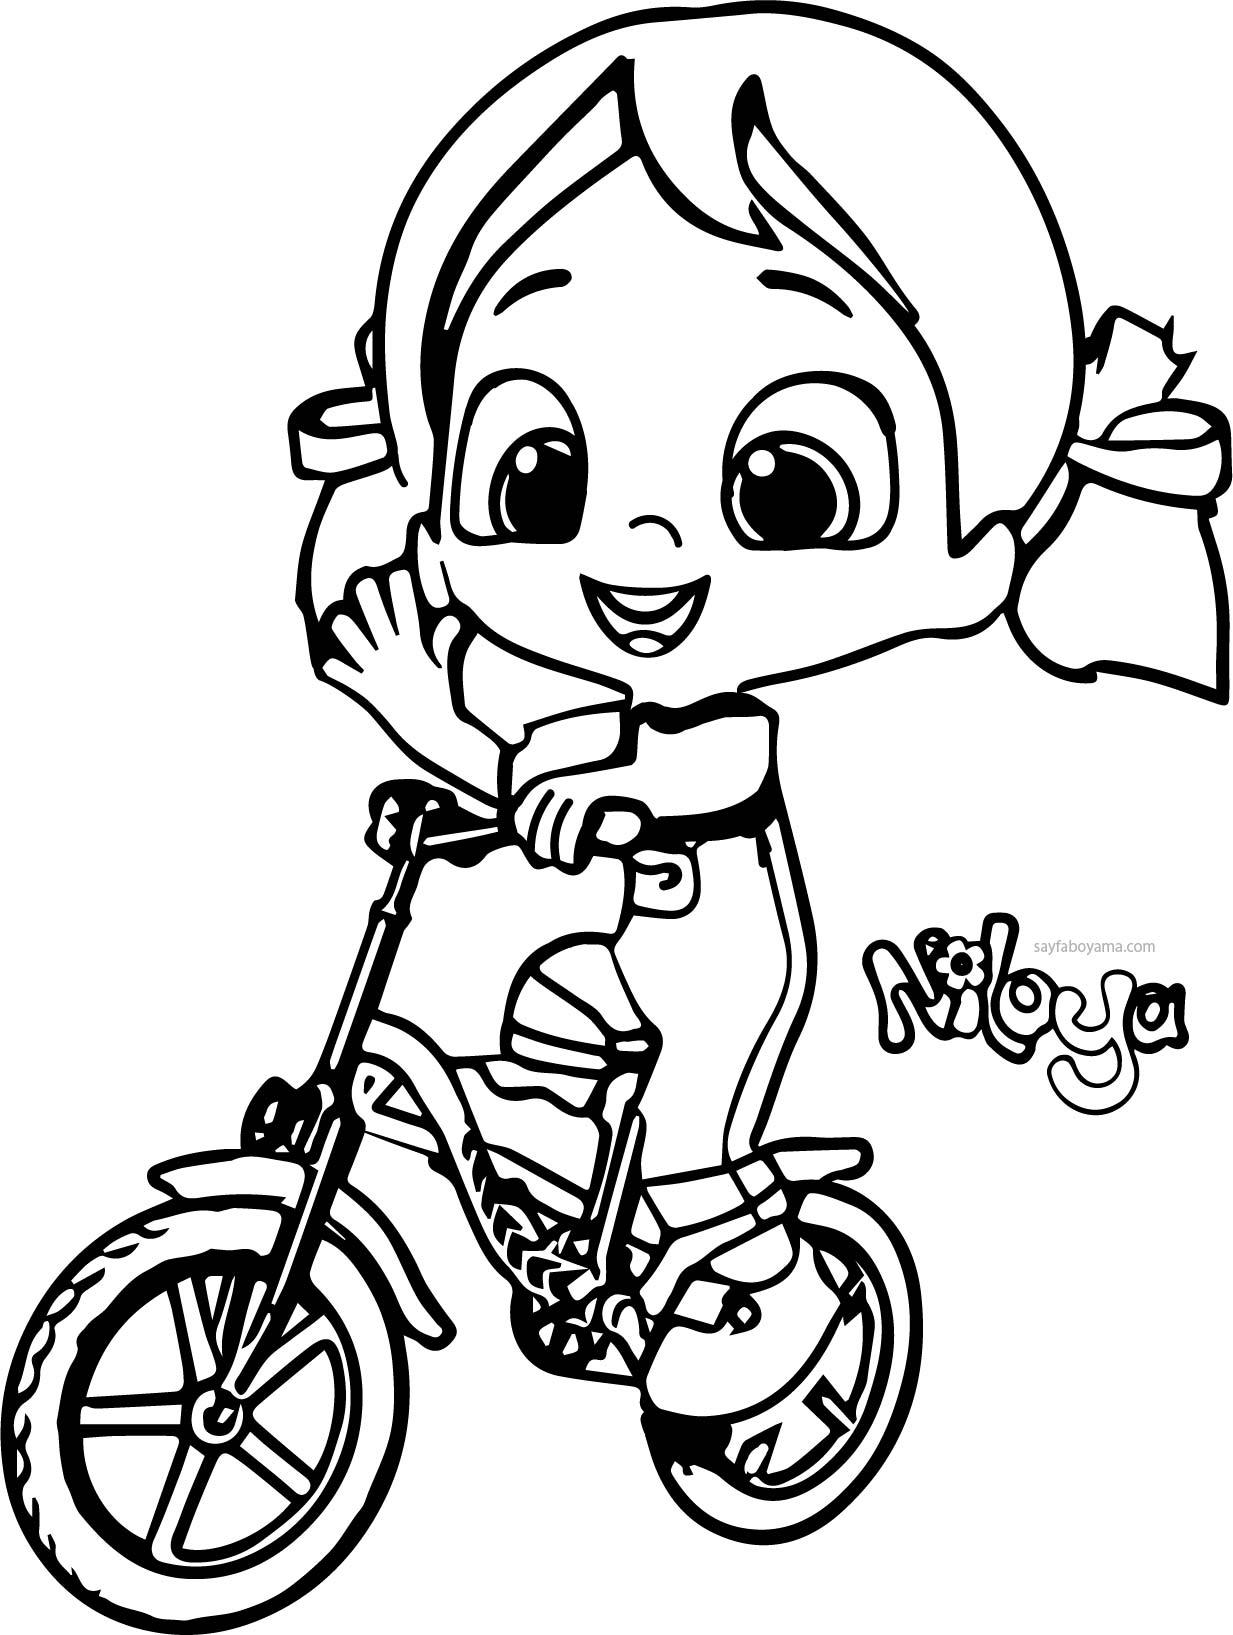 Niloya Bisiklet Boyama 591298 Hd Wallpaper Backgrounds Download